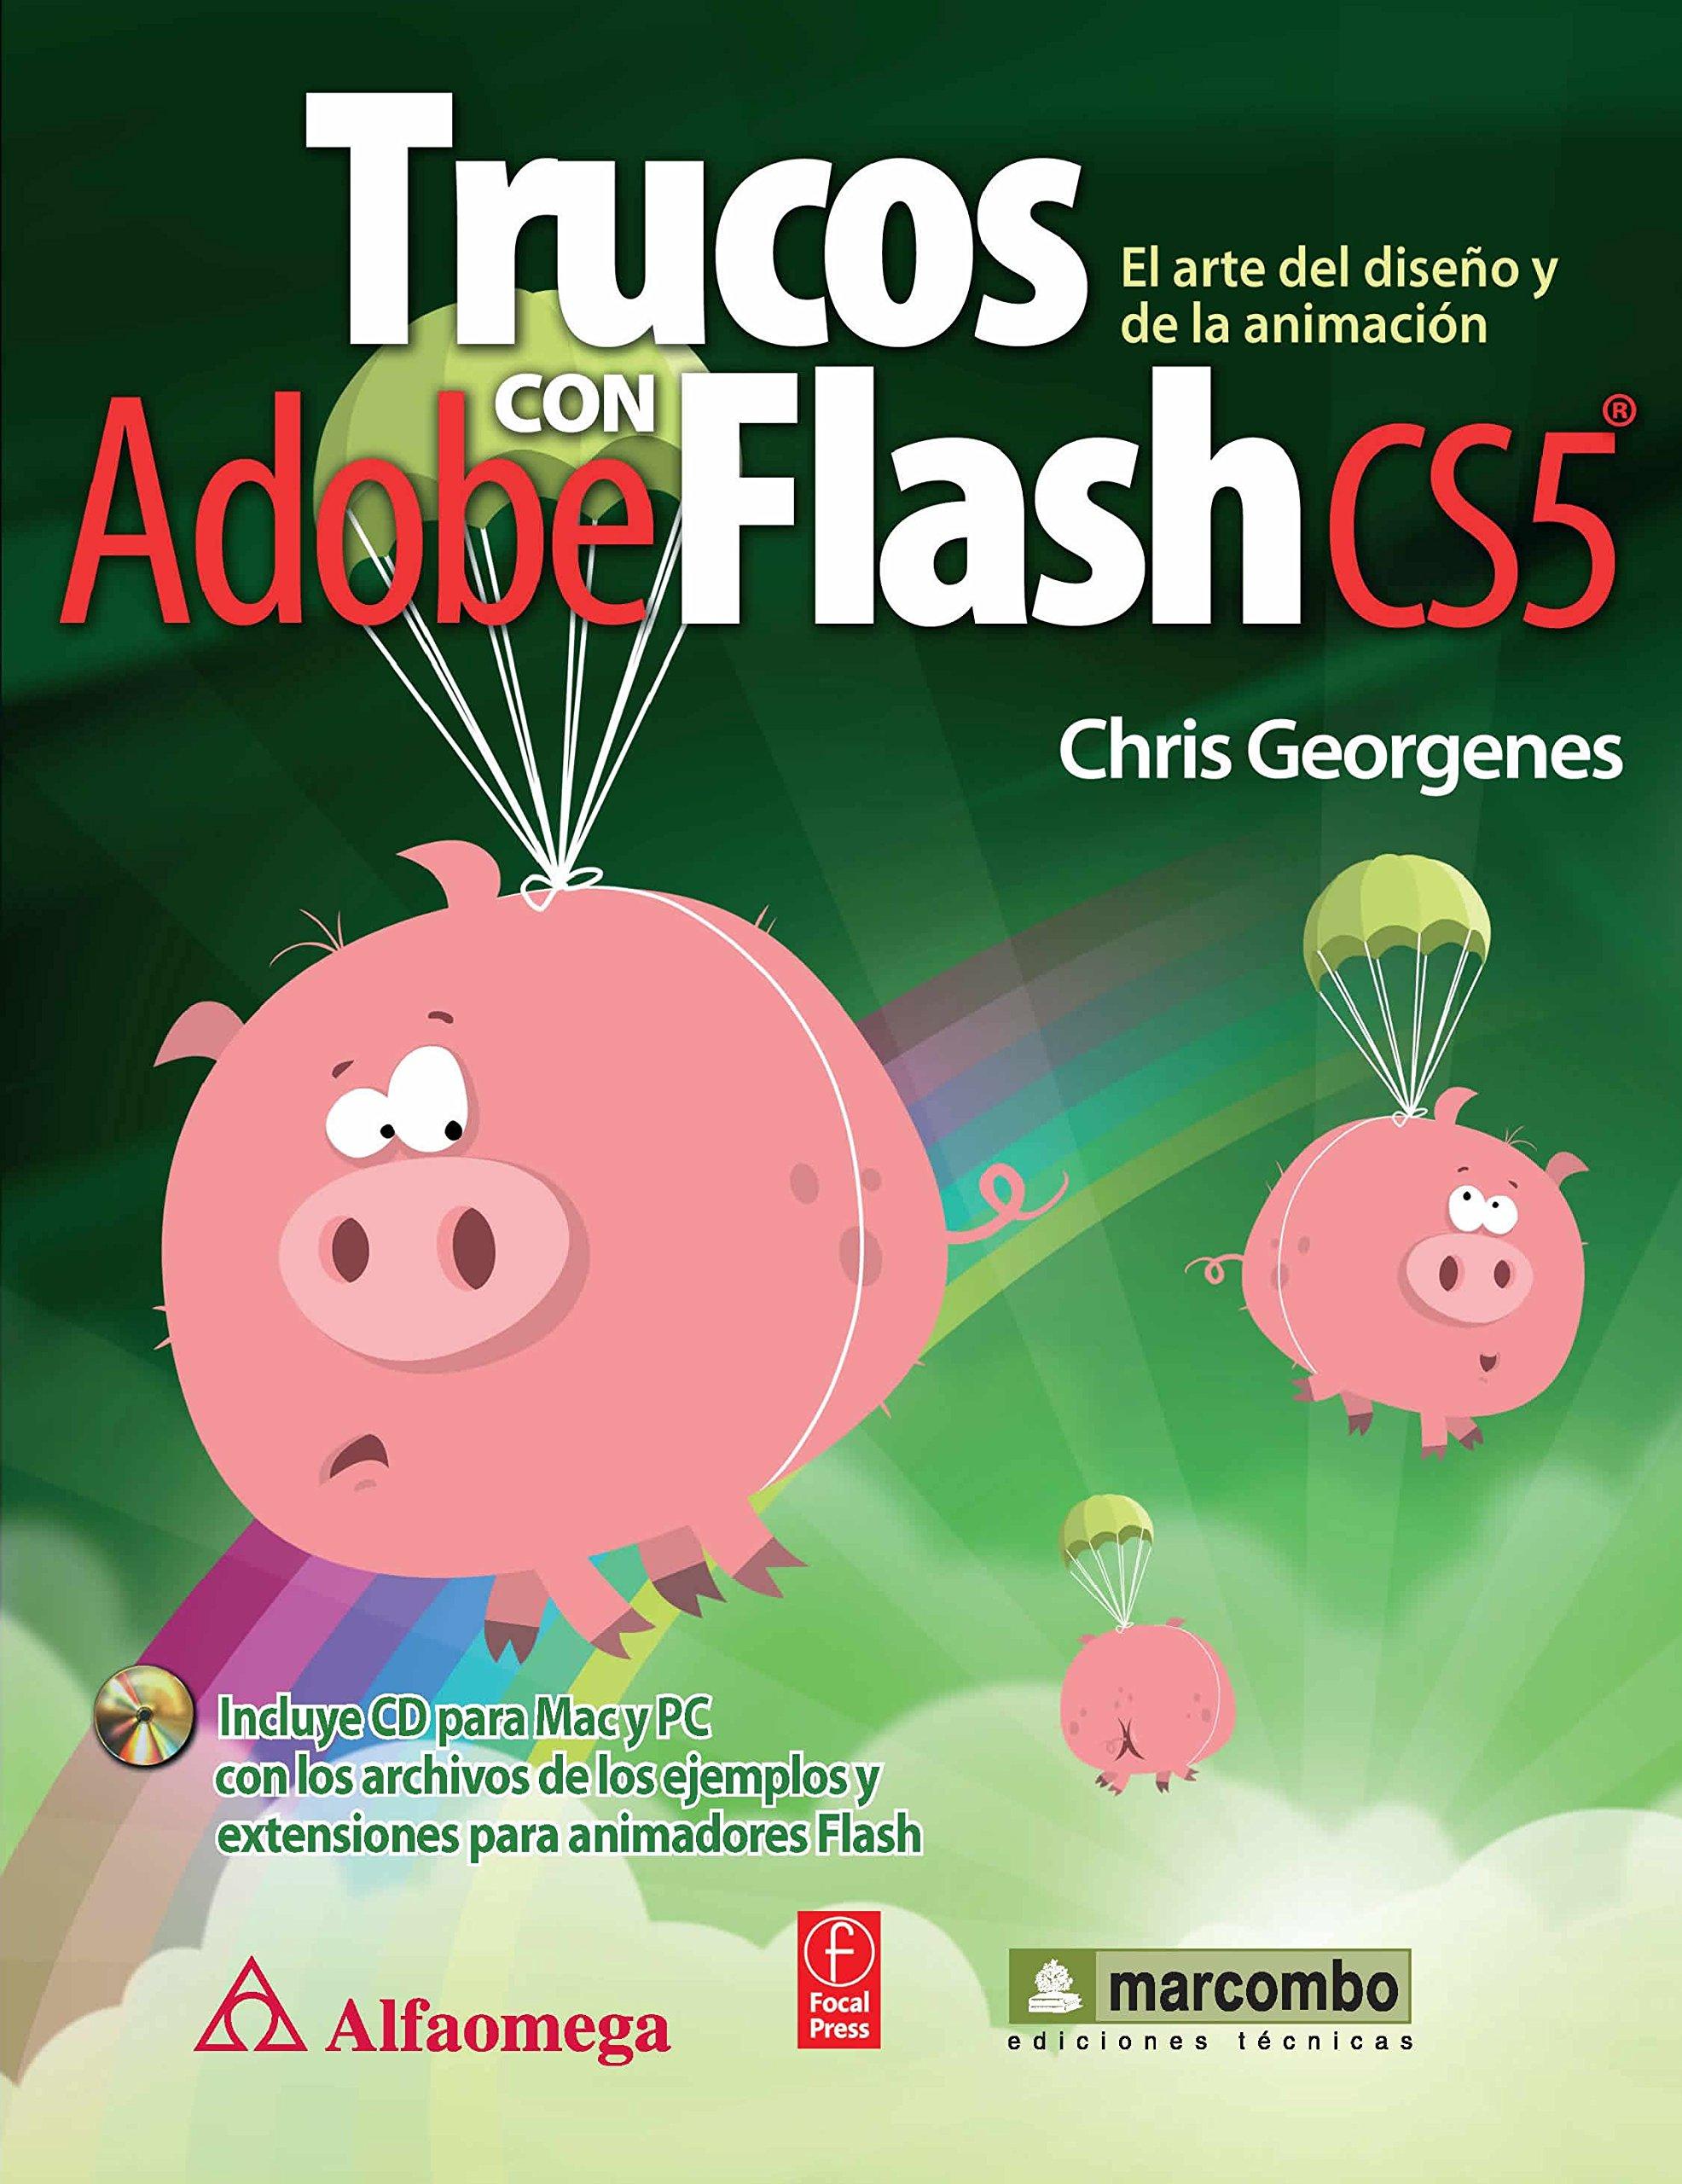 Trucos con Adobe Flash CS5 (Spanish Edition): Chris Georgenes, Alfaomega Grupo Editor, http://www.alfaomega.com.mx/af/images/libros/5431_1?1327533585: ...